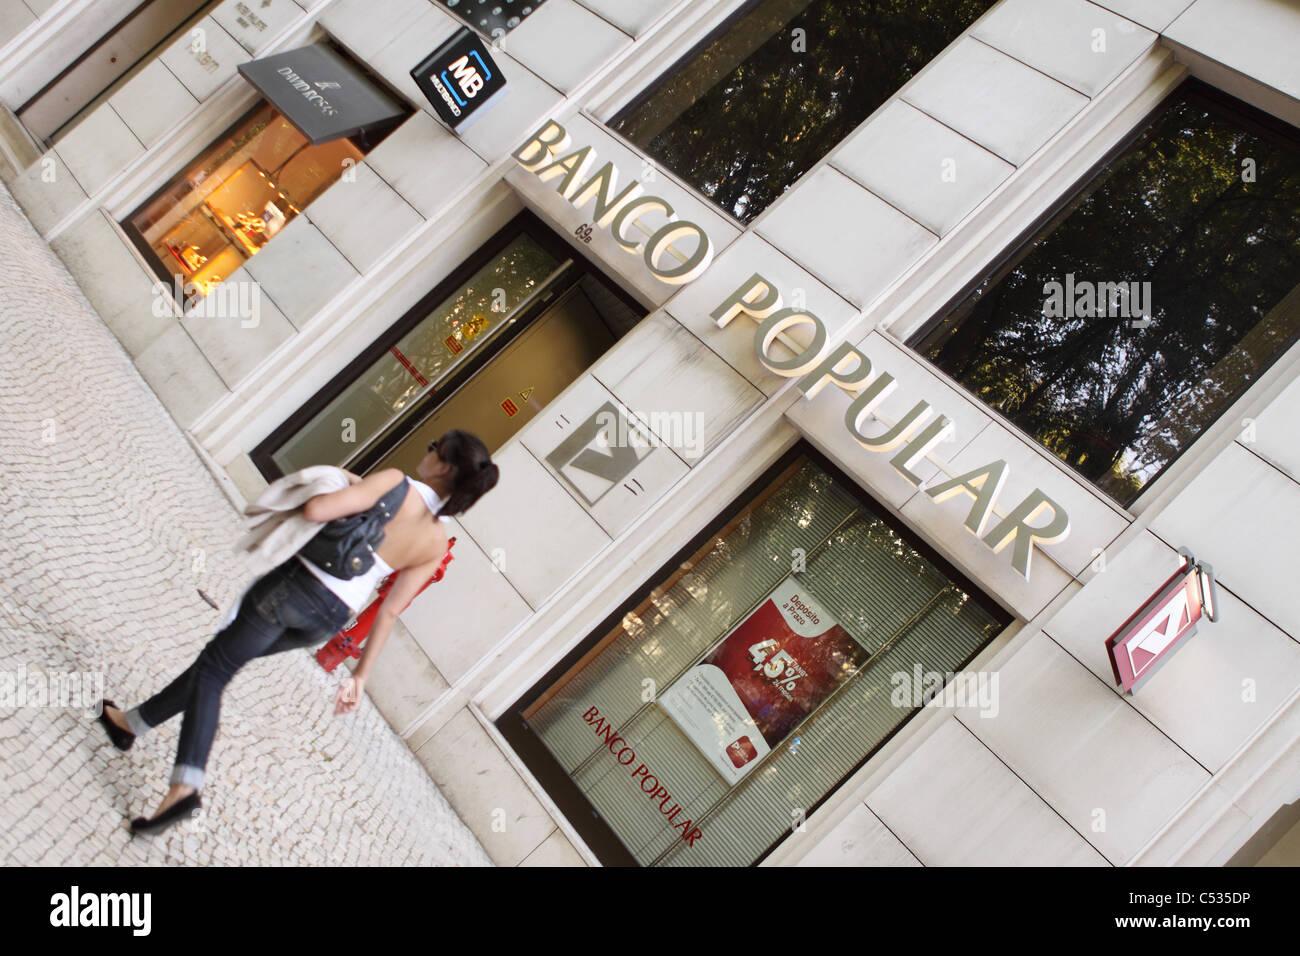 Lisbon Portugal bank Banco Popular branch - Stock Image